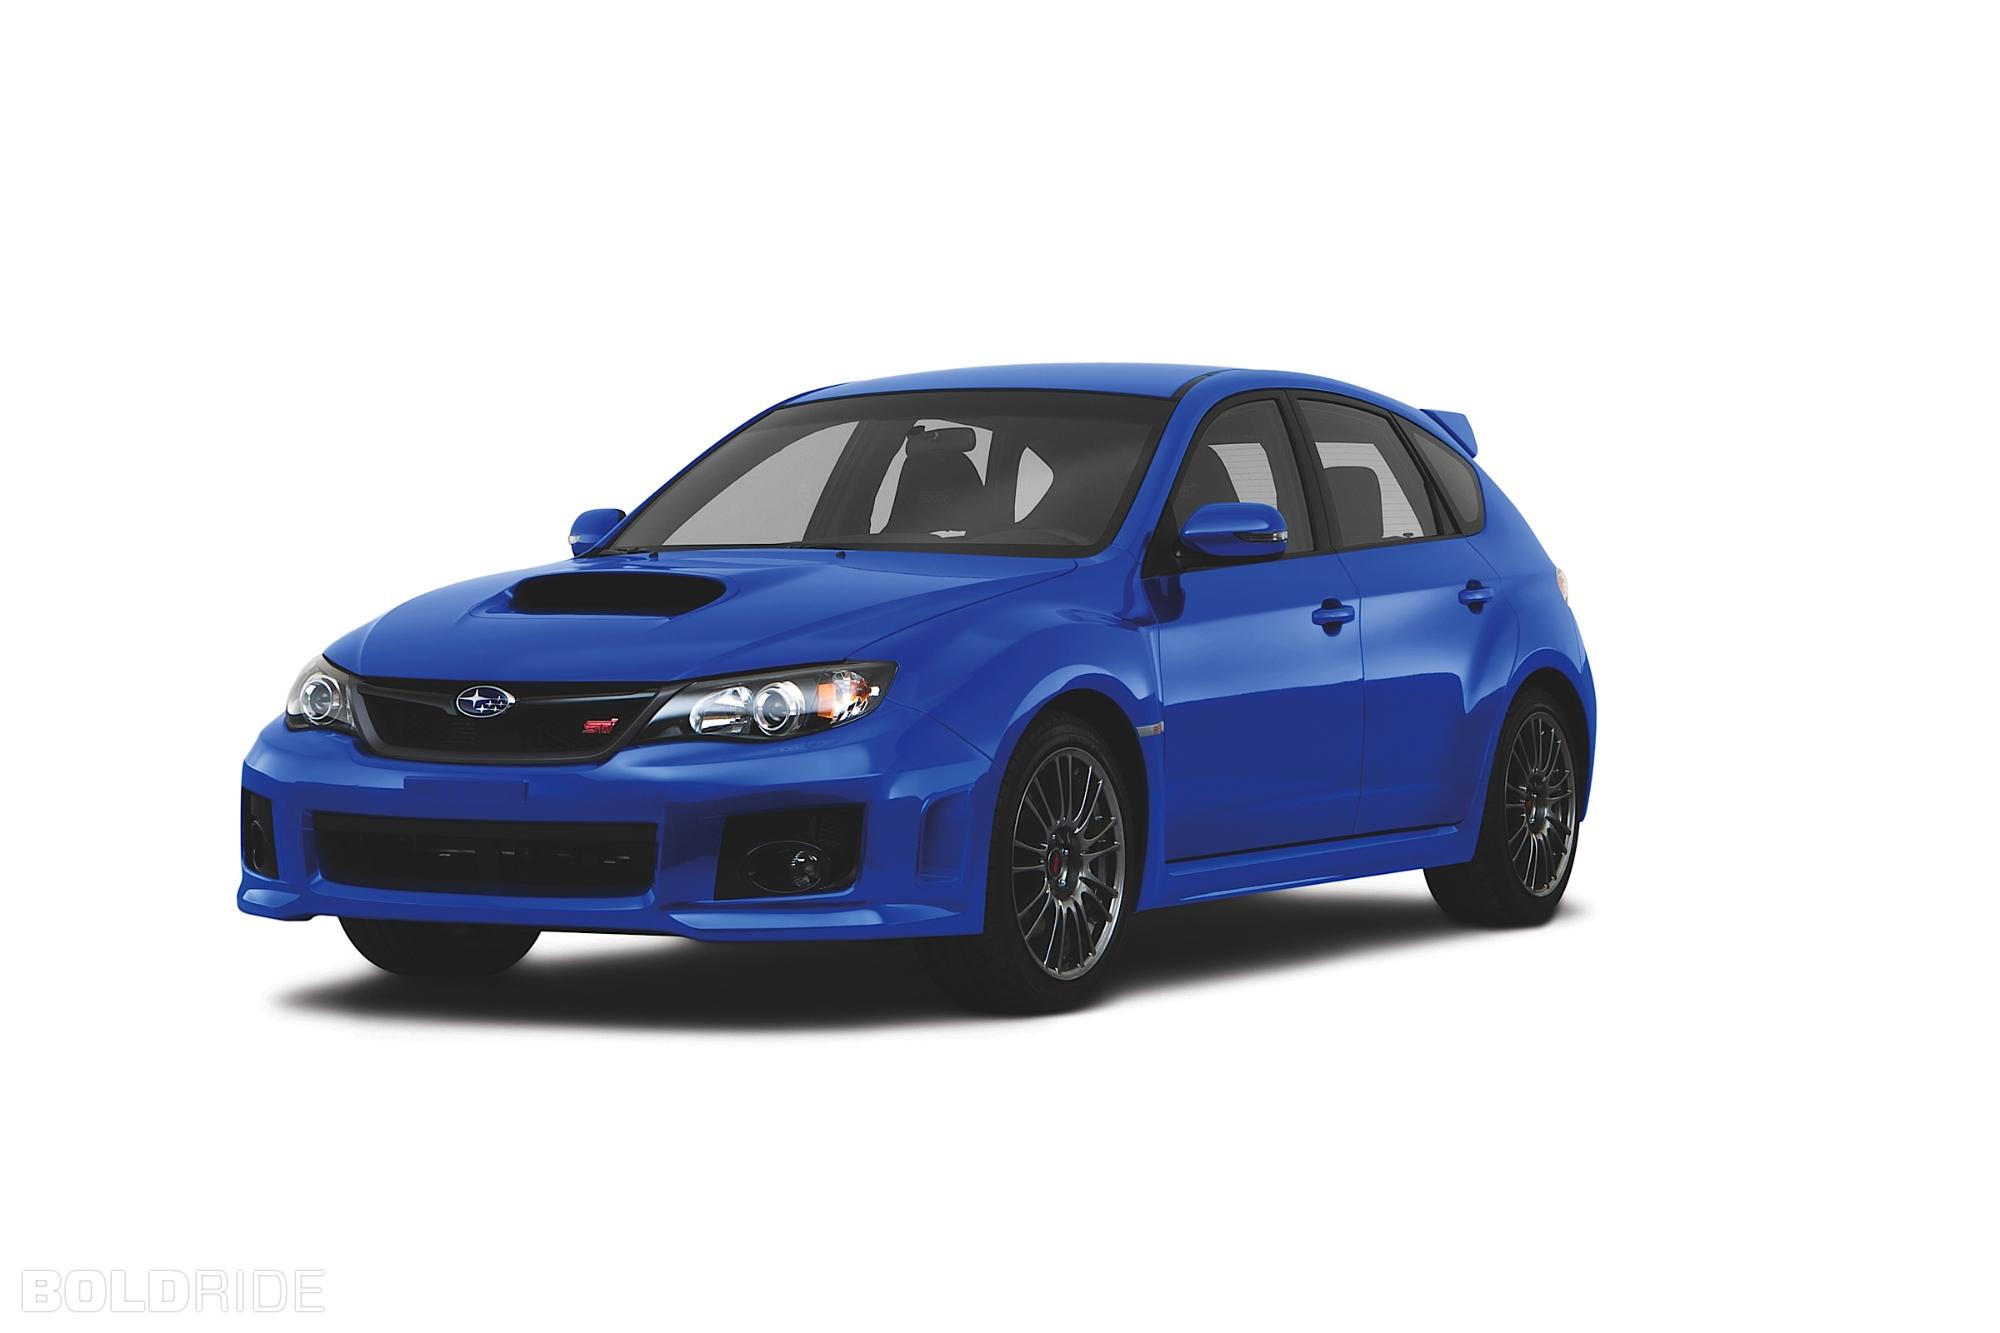 2011 Subaru Impreza WRX STI 5-door 1280 x 1080